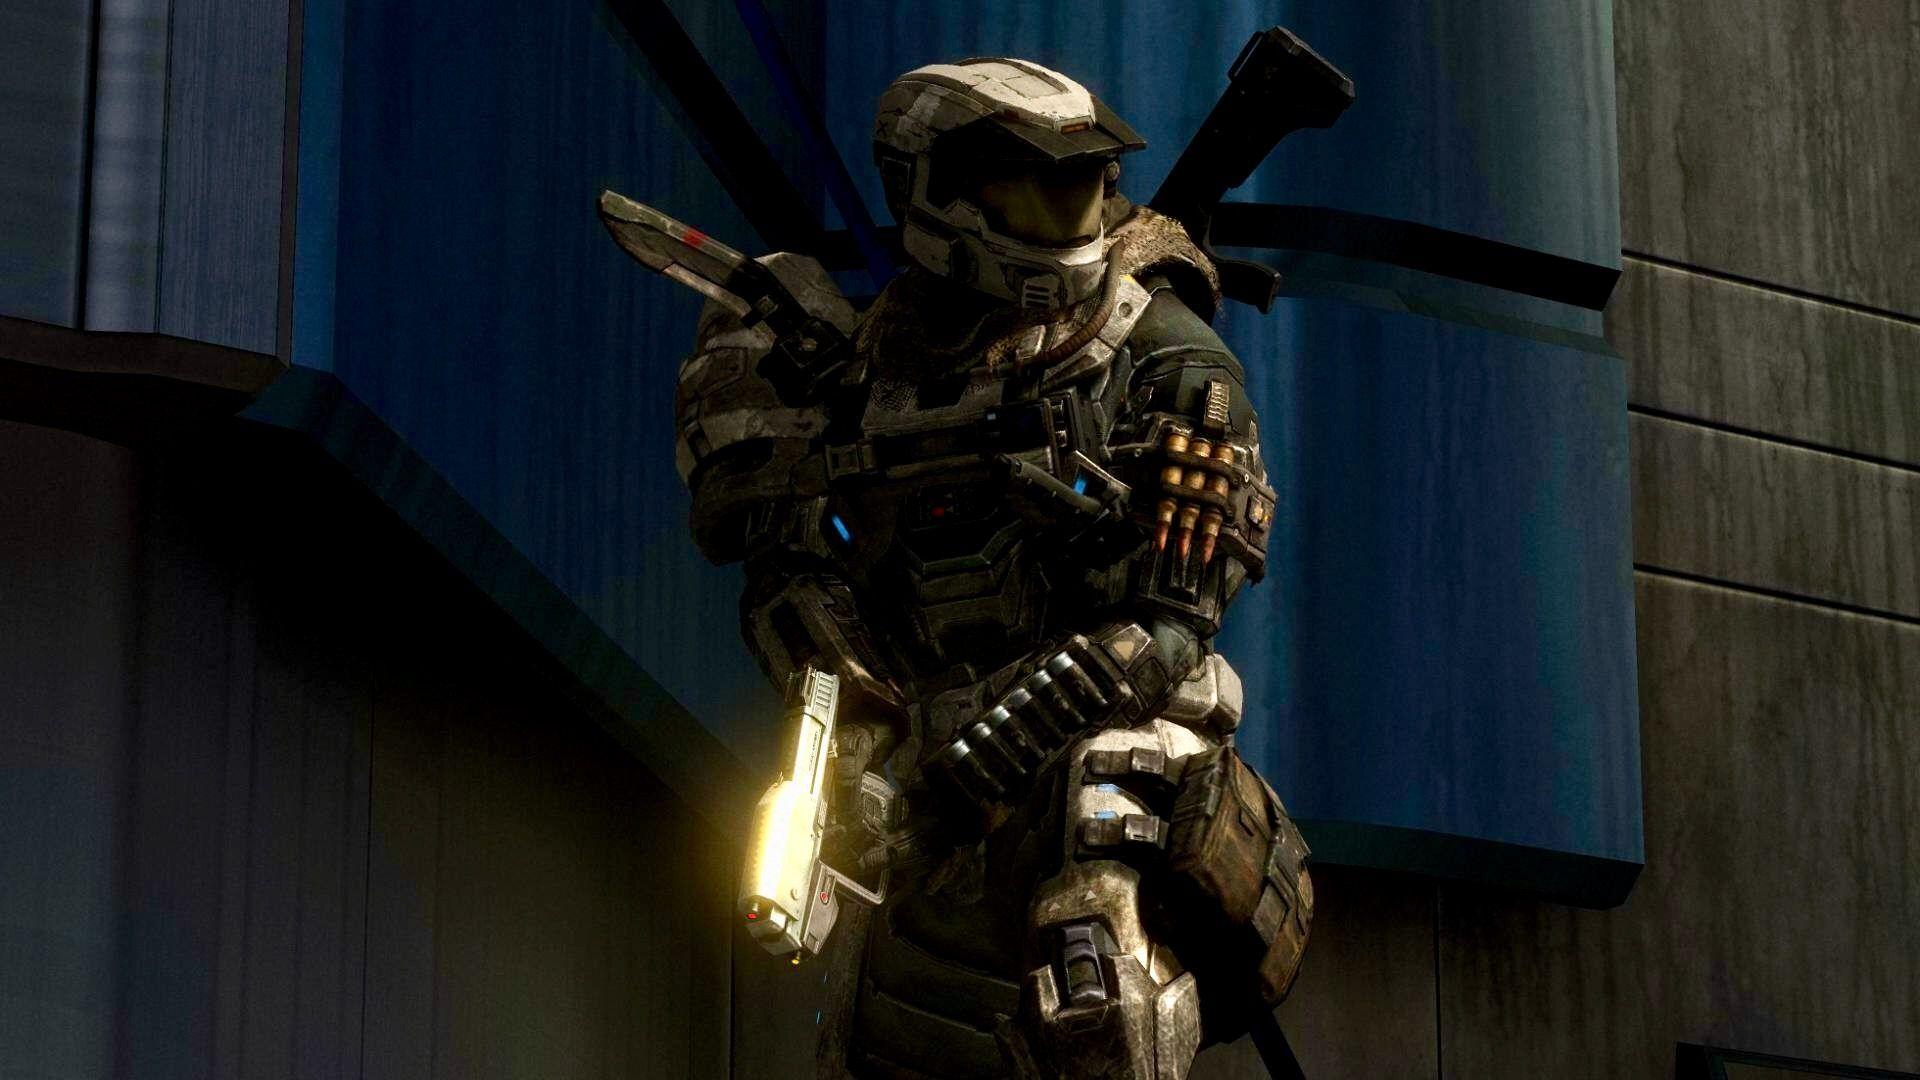 Stay Alert Of Any Hostile Activity Spartan Halo Reach Halo